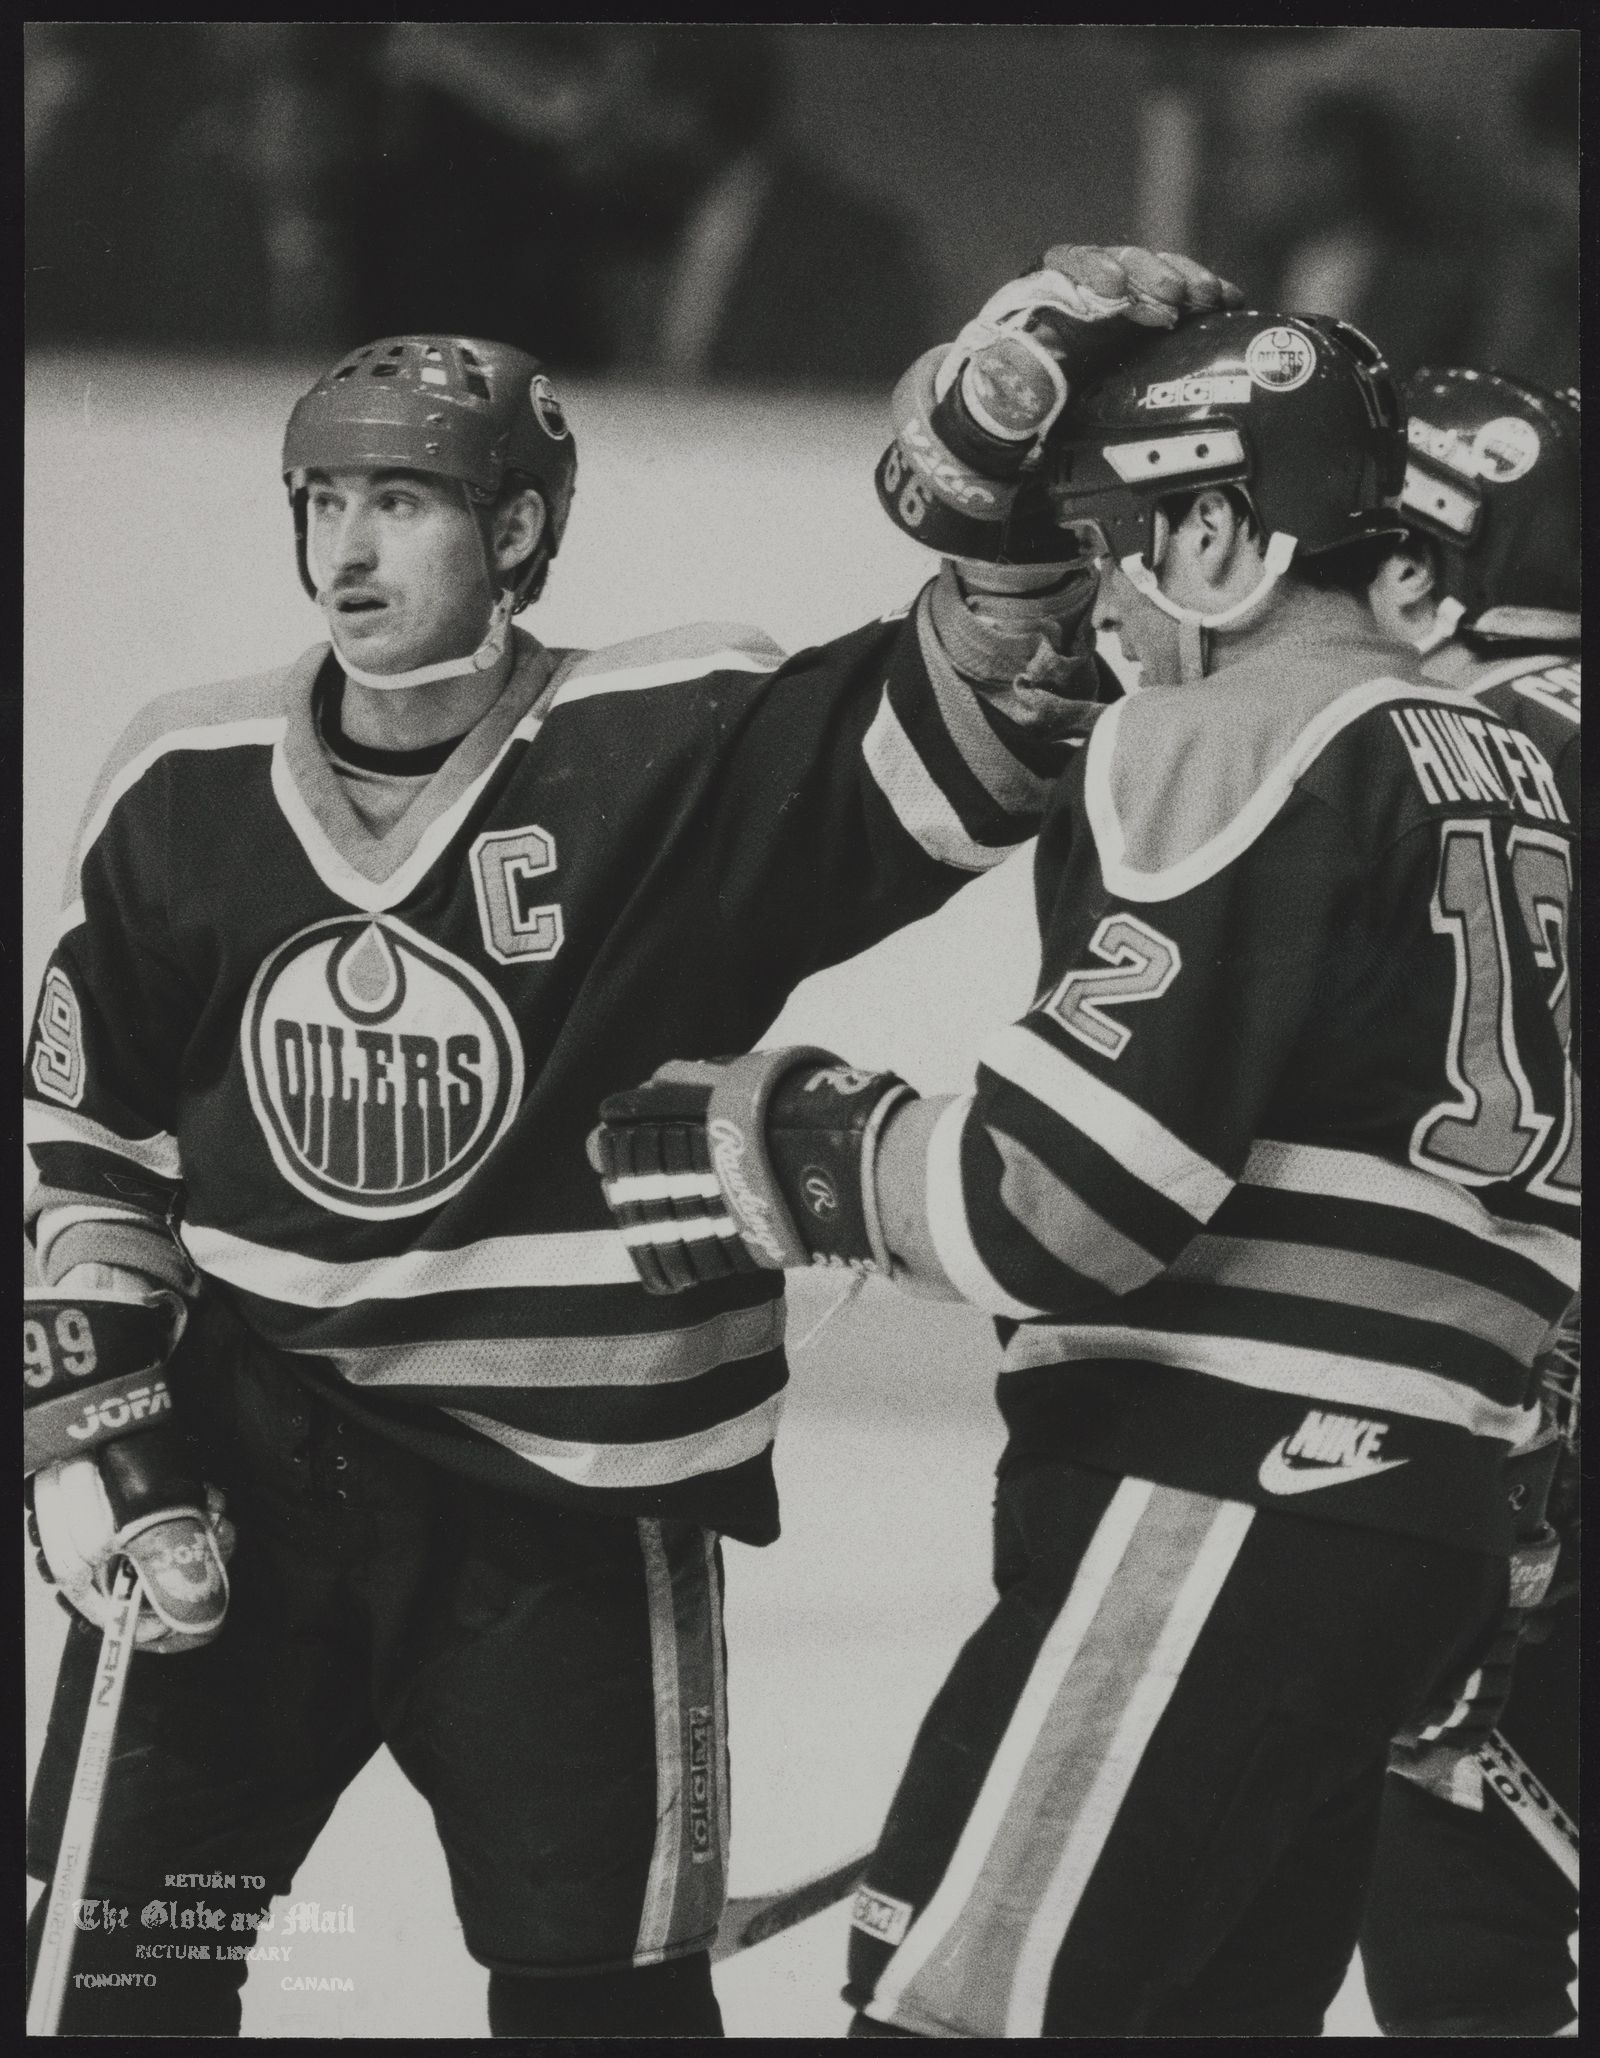 EDMONTON OILERS HOCKEY TEAM Wayne Gretzky and Oiler teammates